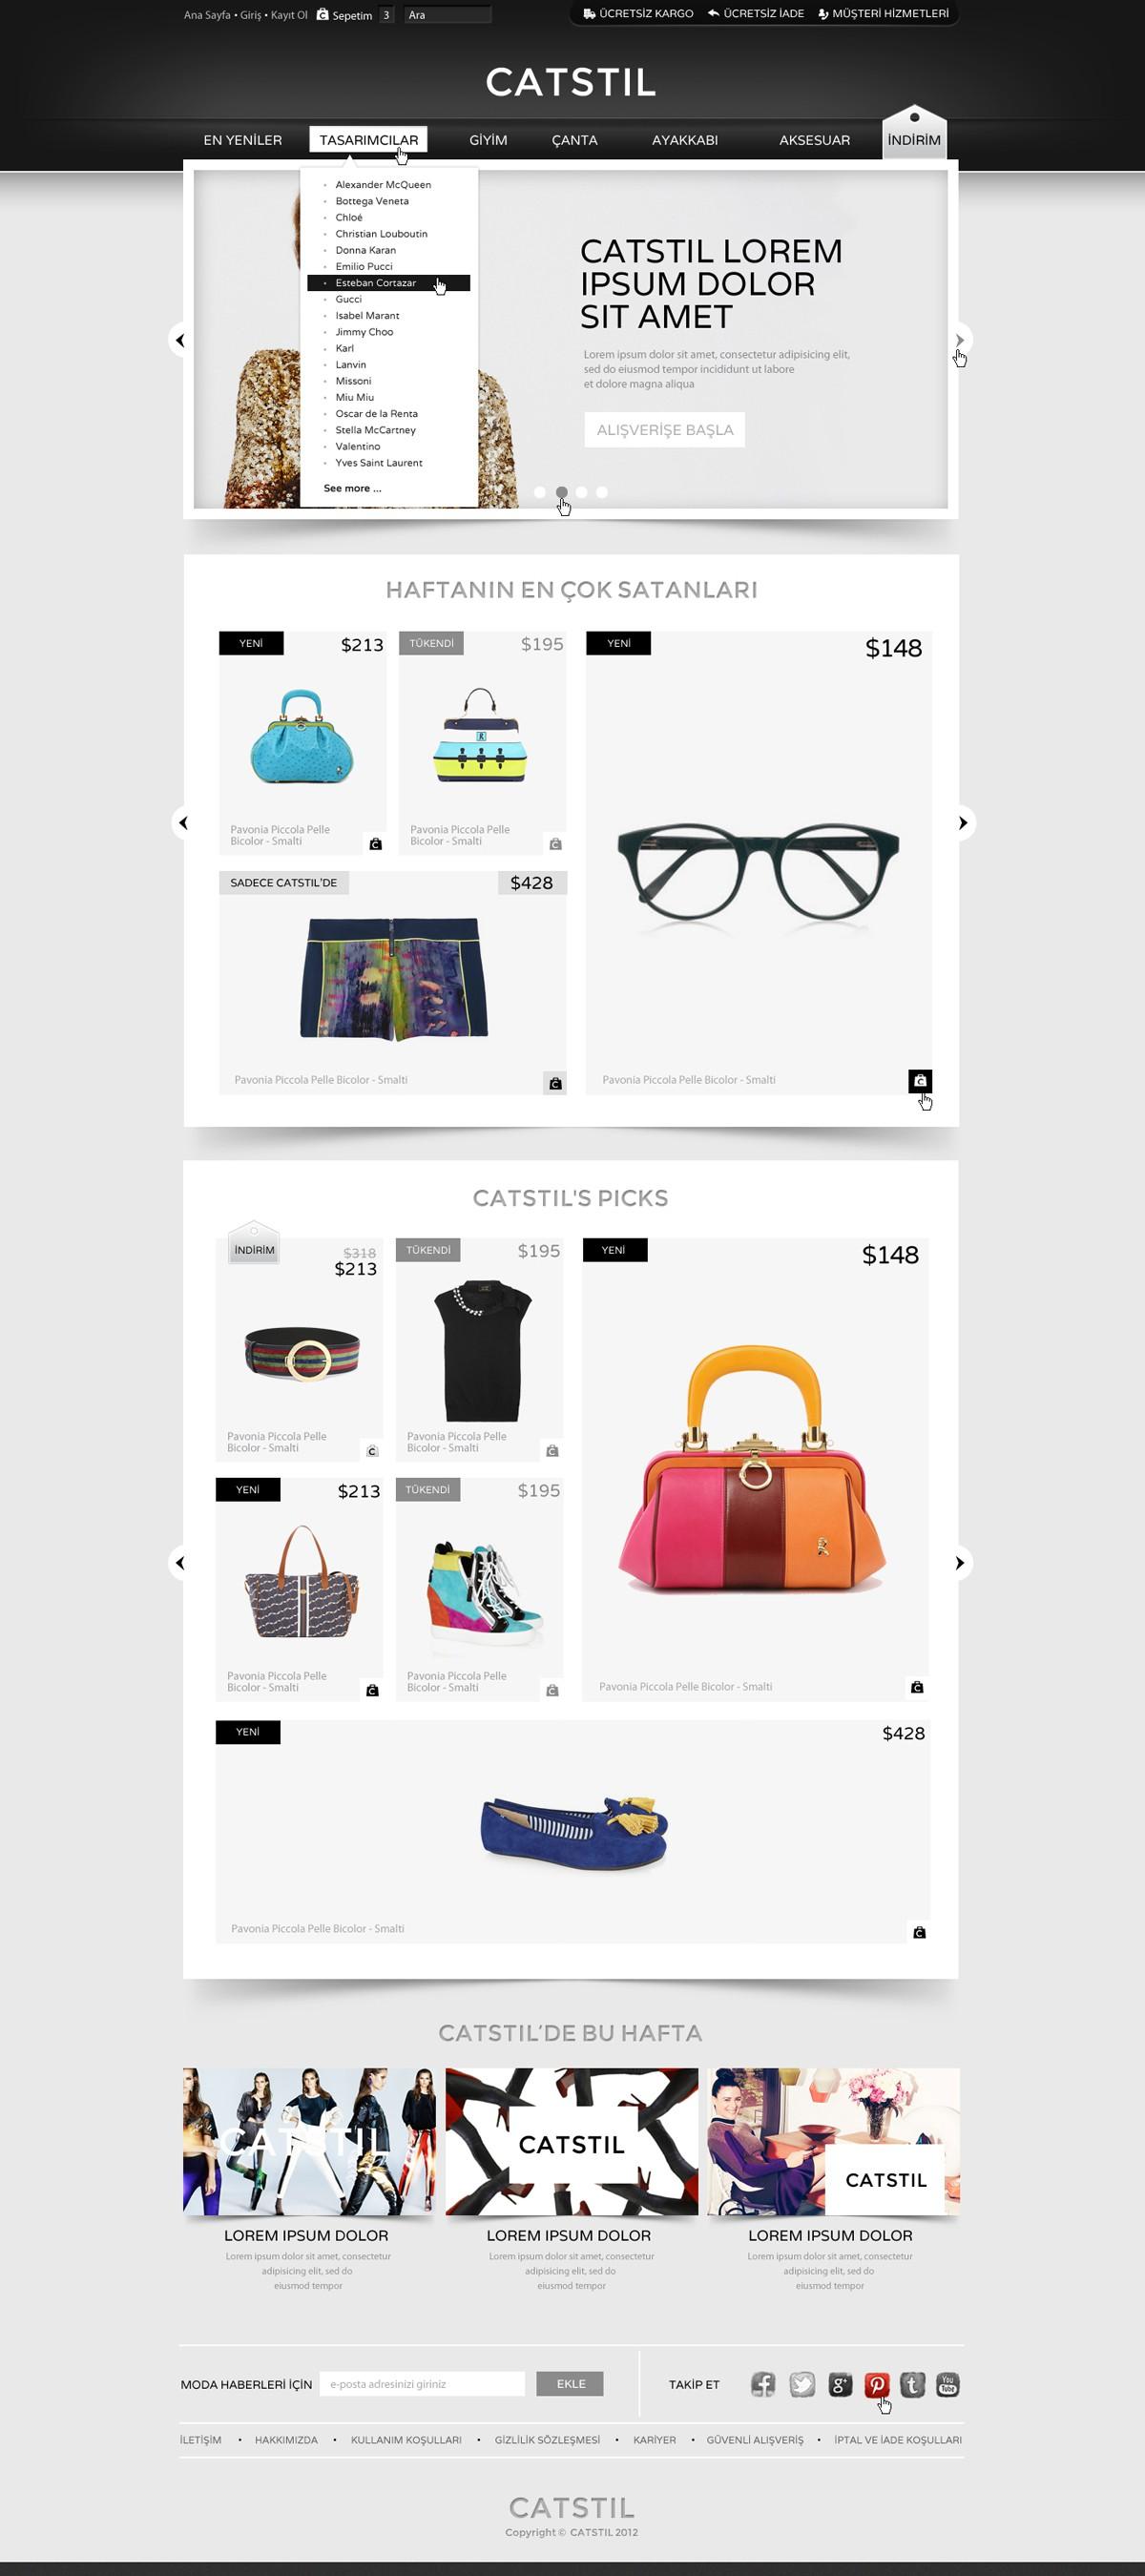 CATSTIL needs a new homepage design